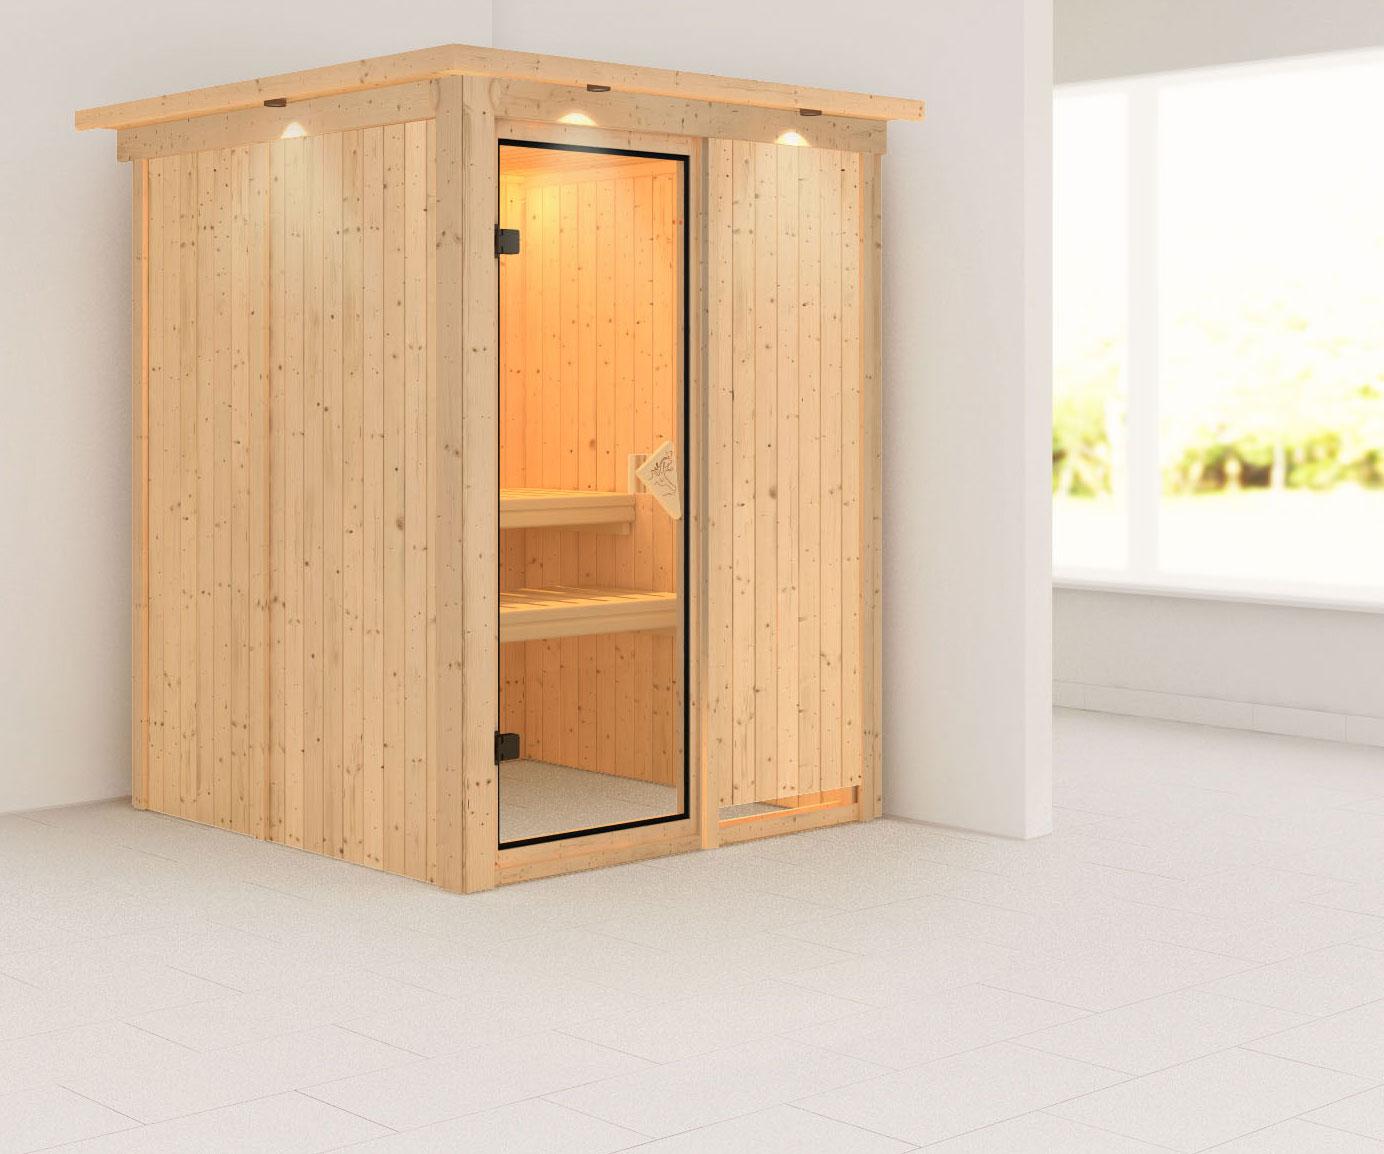 karibu sauna norin 68mm dachkranz ohne ofen classic t r bei. Black Bedroom Furniture Sets. Home Design Ideas